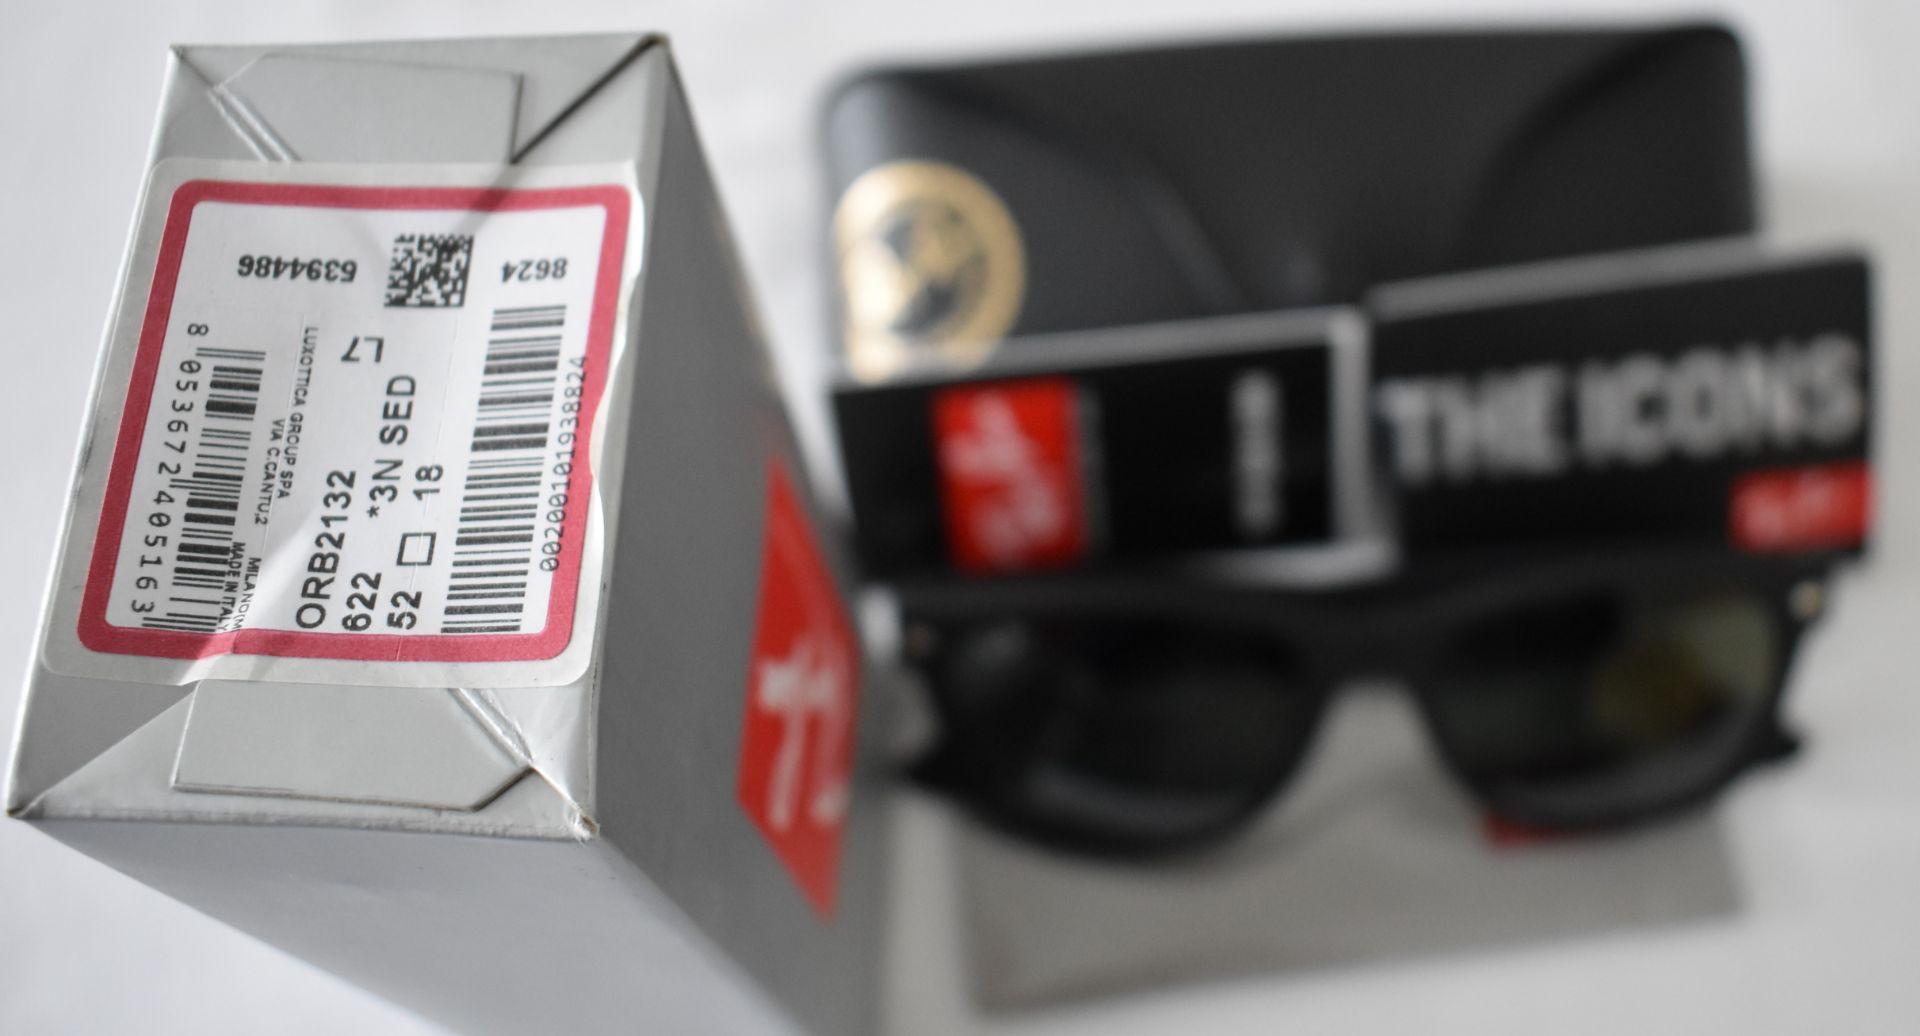 Ray Ban Sunglasses ORB2132 622 *3N - Image 2 of 2